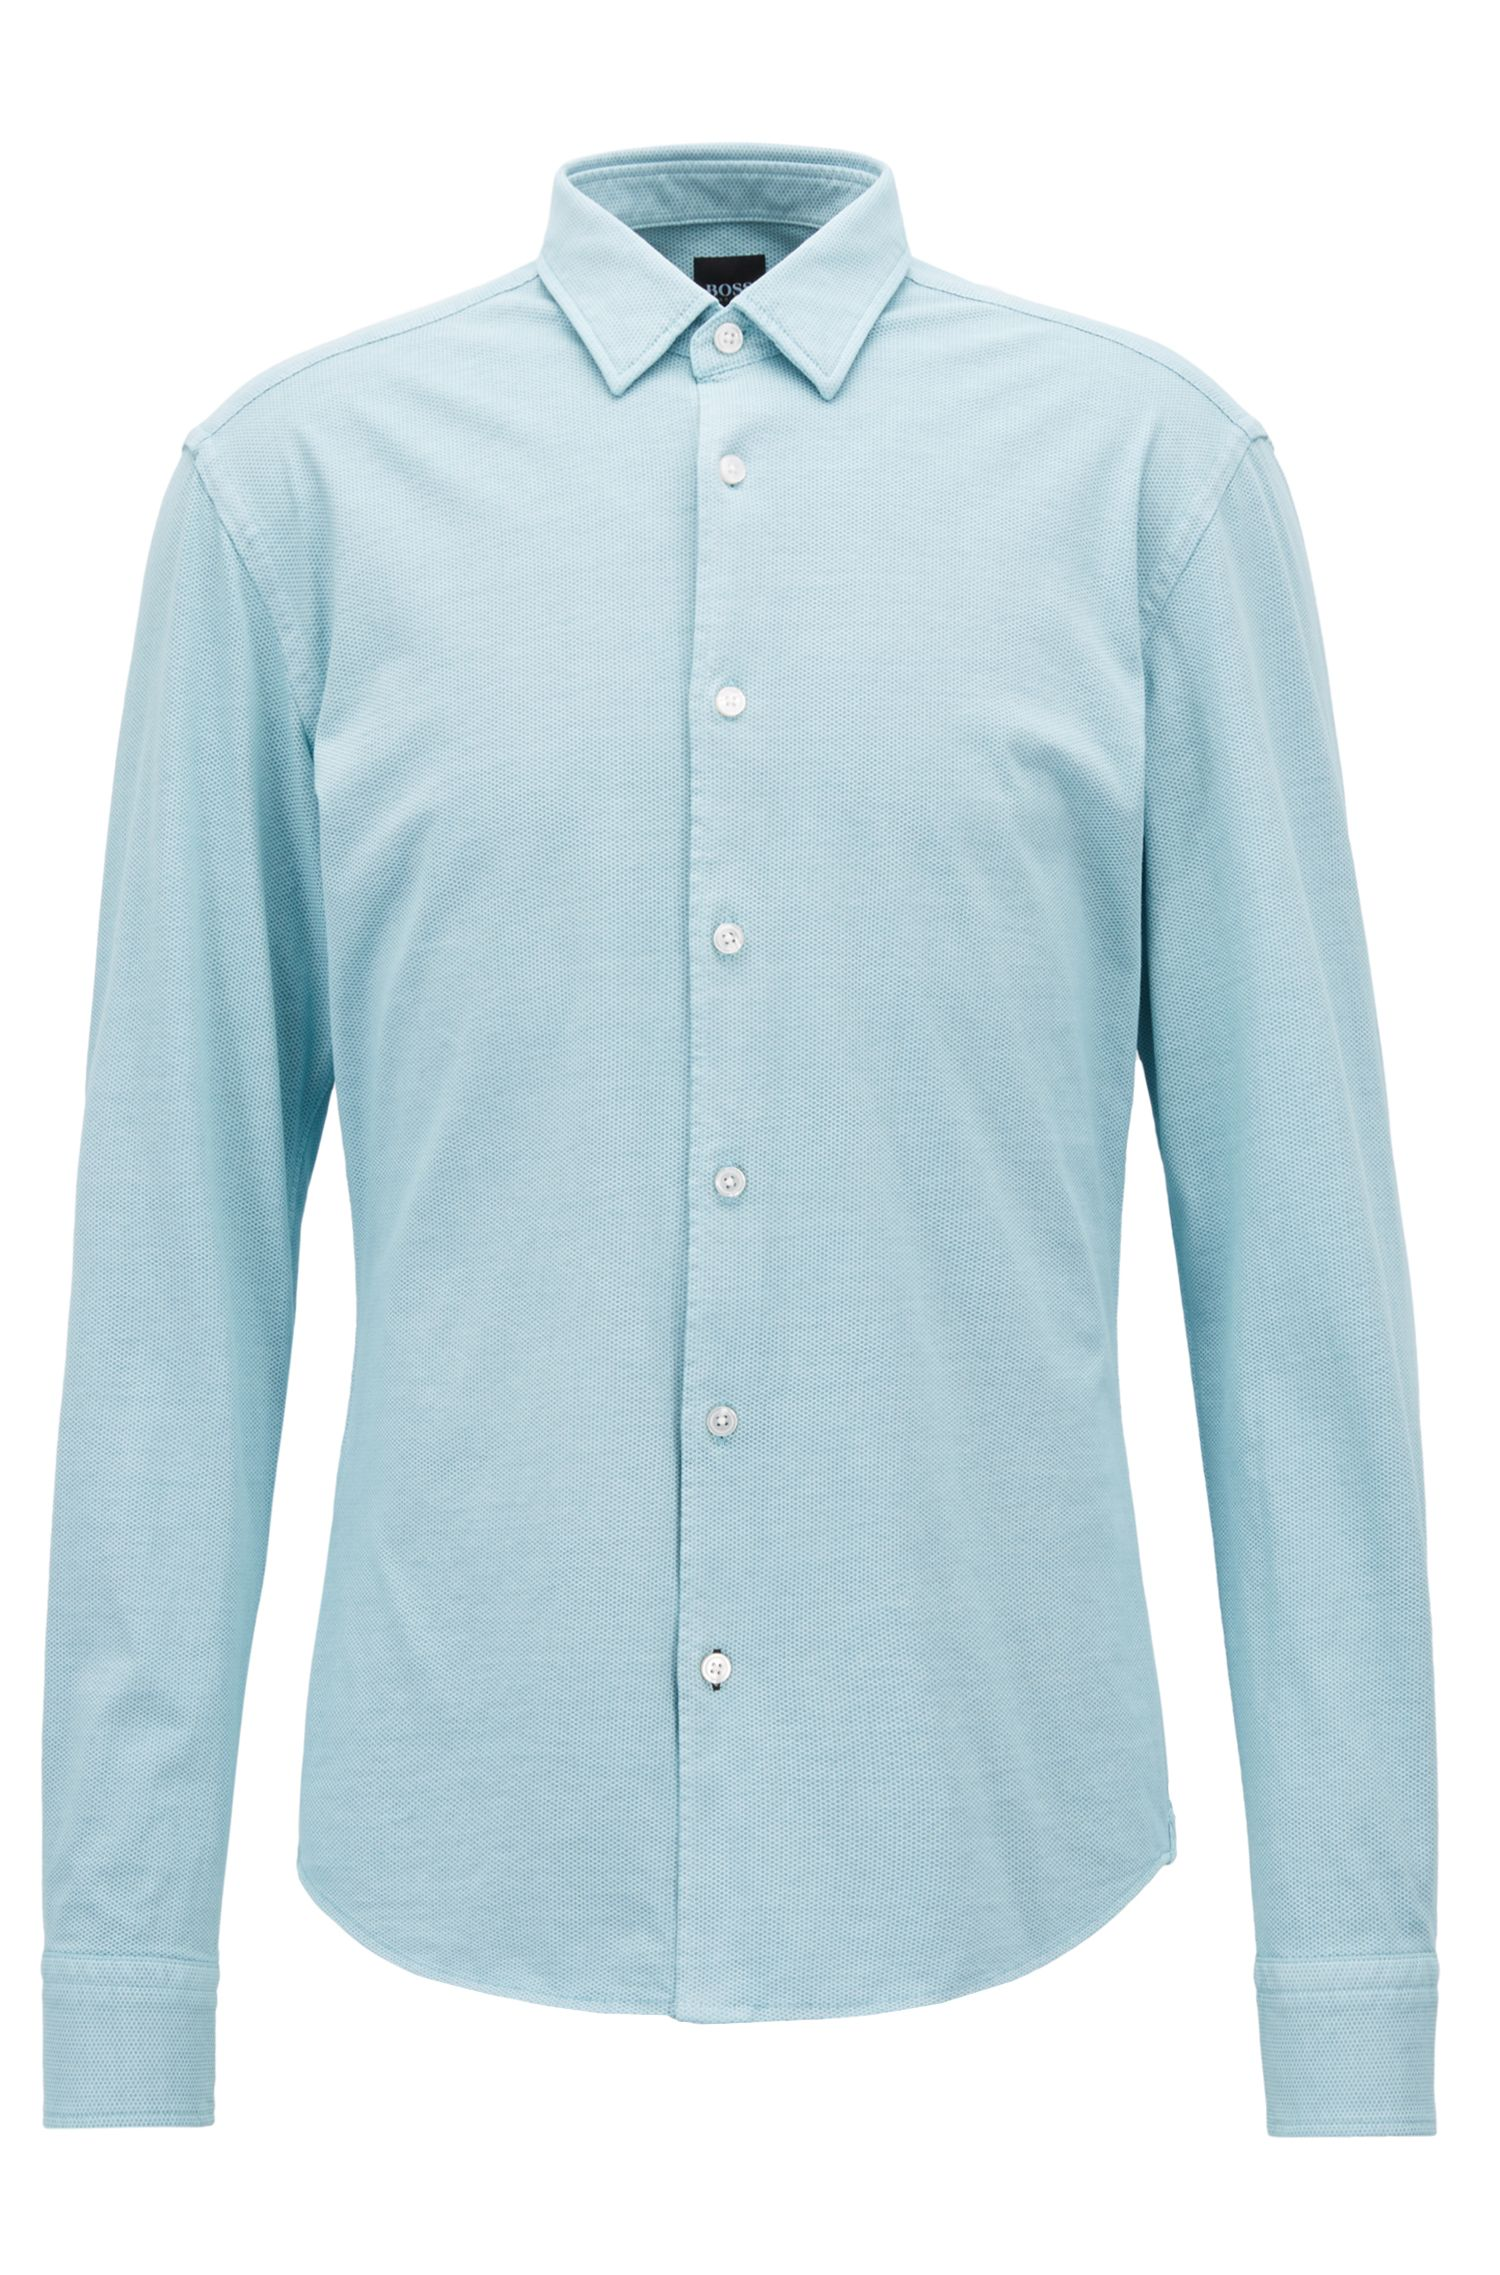 Cotton Sport Shirt, Slim Fit | Reid F, Light Blue